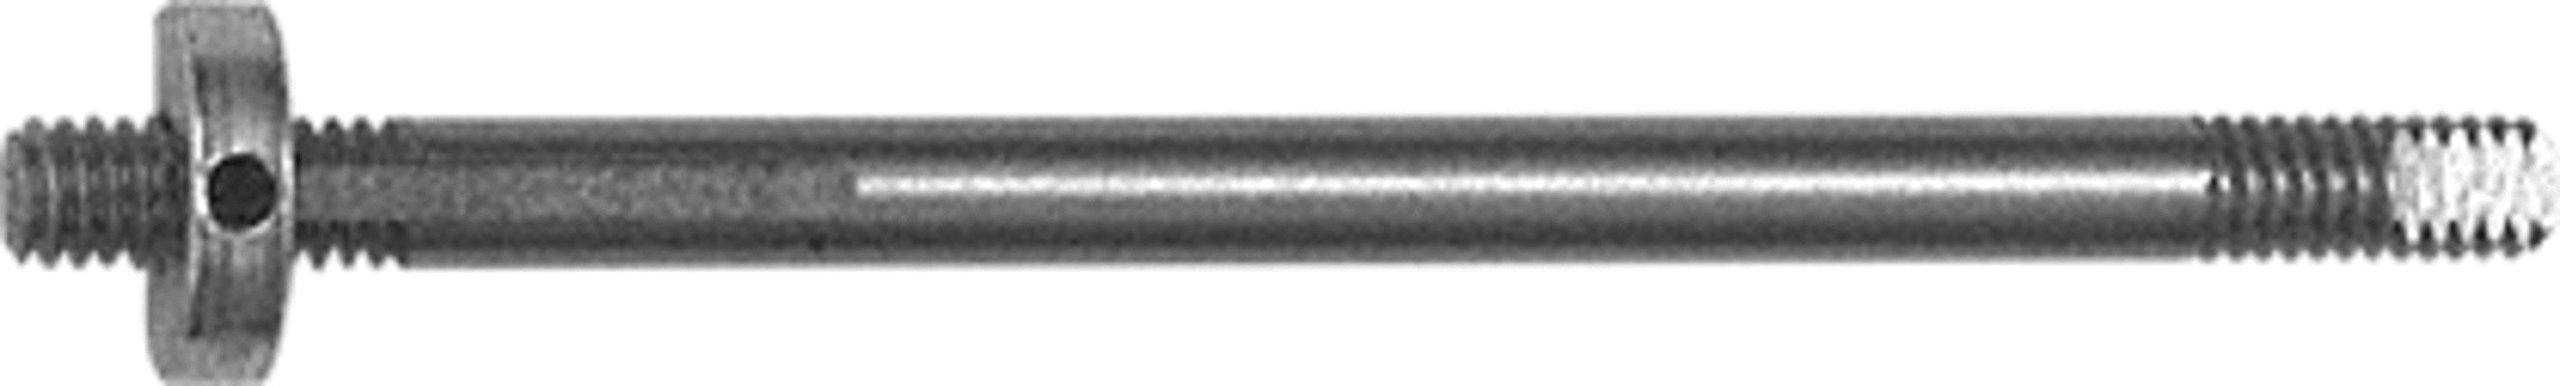 CRL 10-24 Replacement Mandrel for Thread Setter Tool - 39256